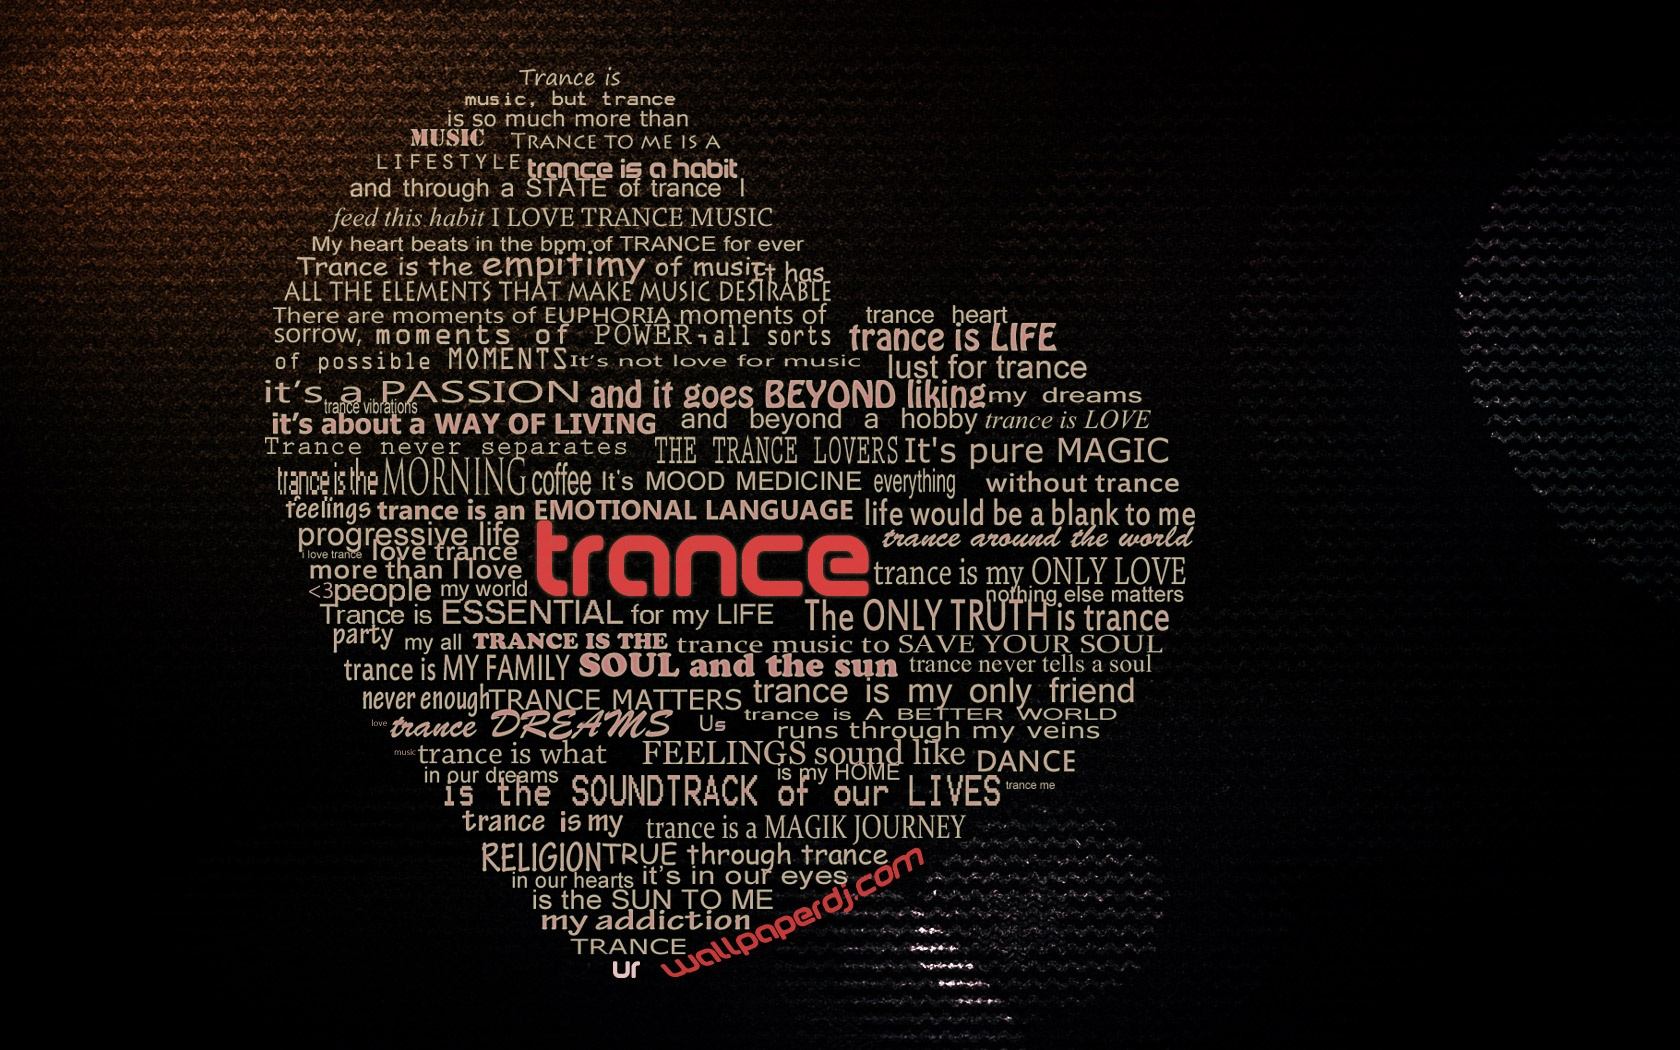 75+] Trance Music Wallpaper on WallpaperSafari